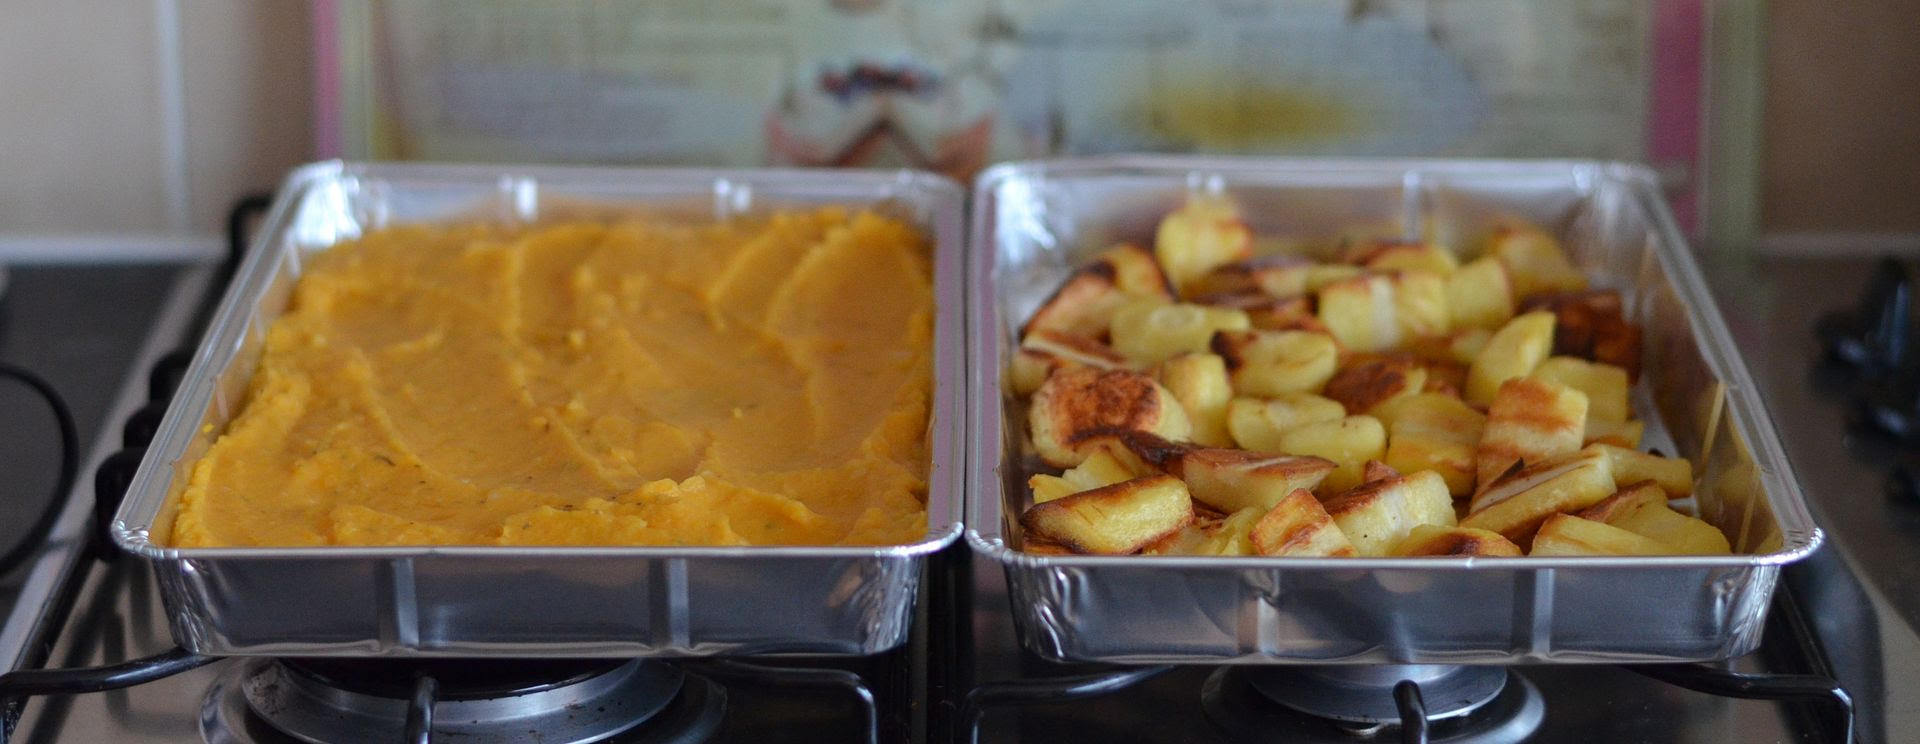 Roast Parsnips & Parsnip Mash